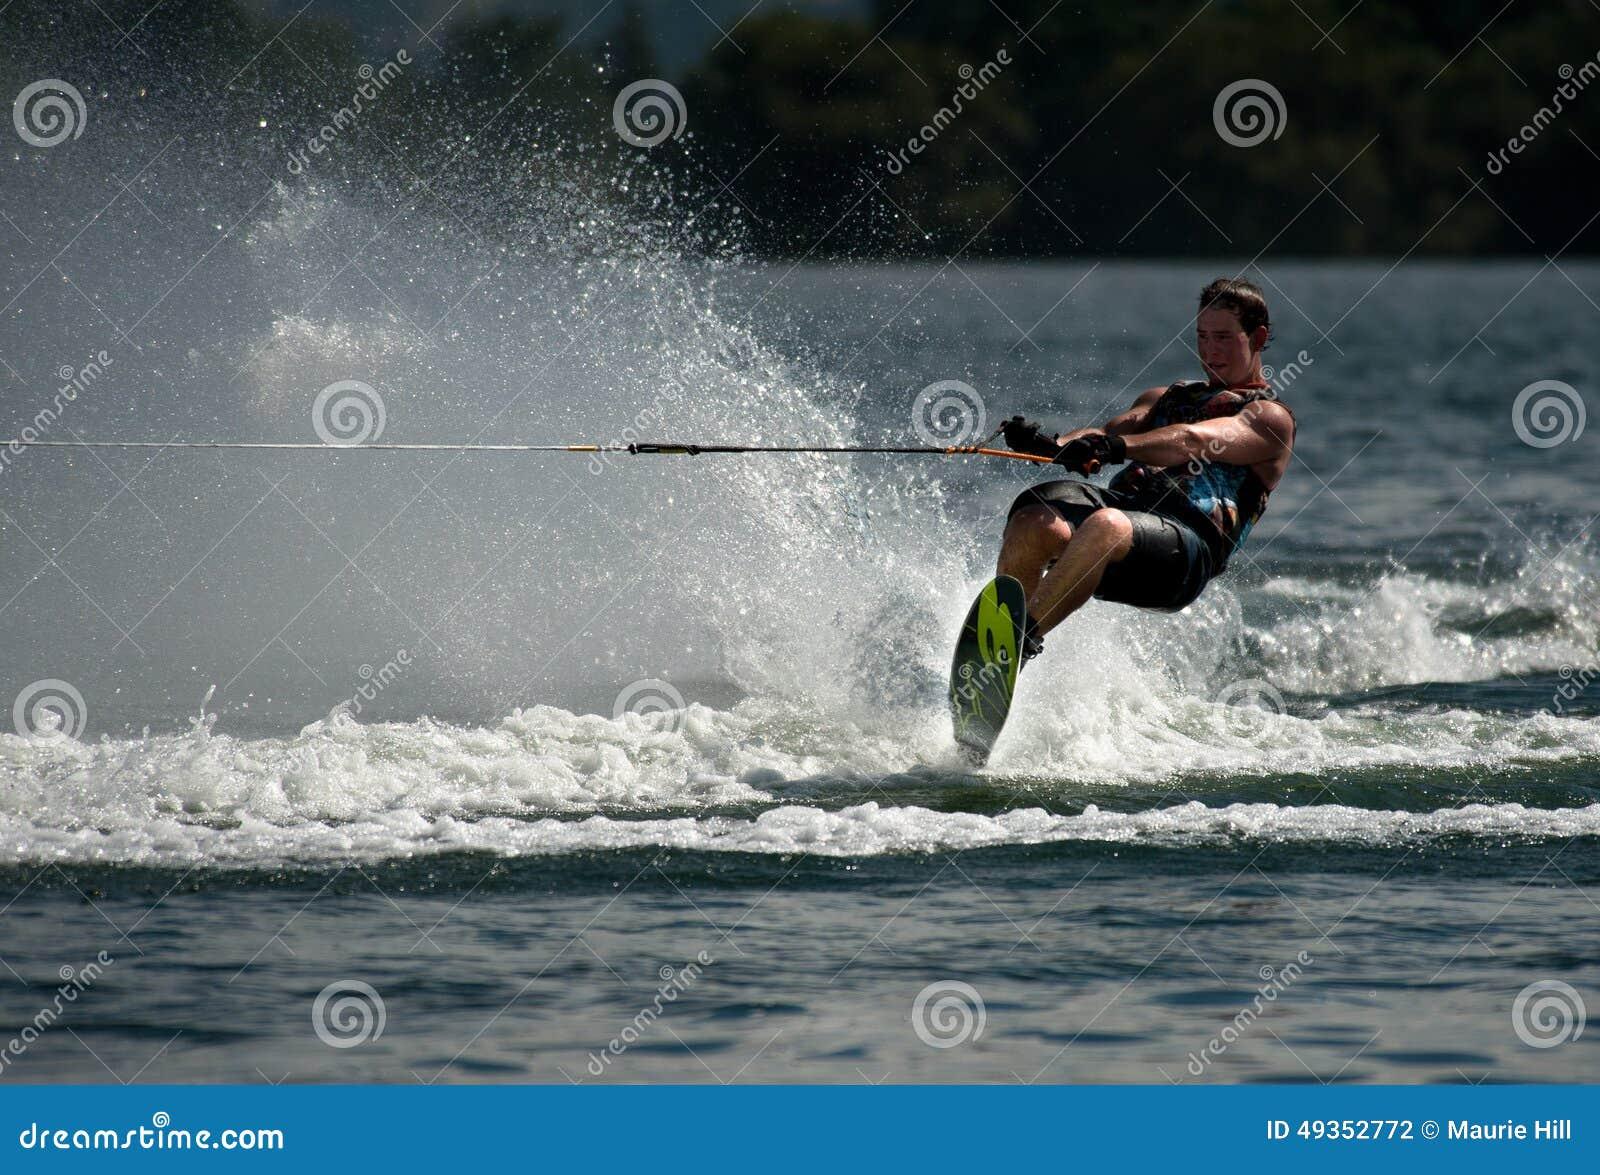 Singles skiing